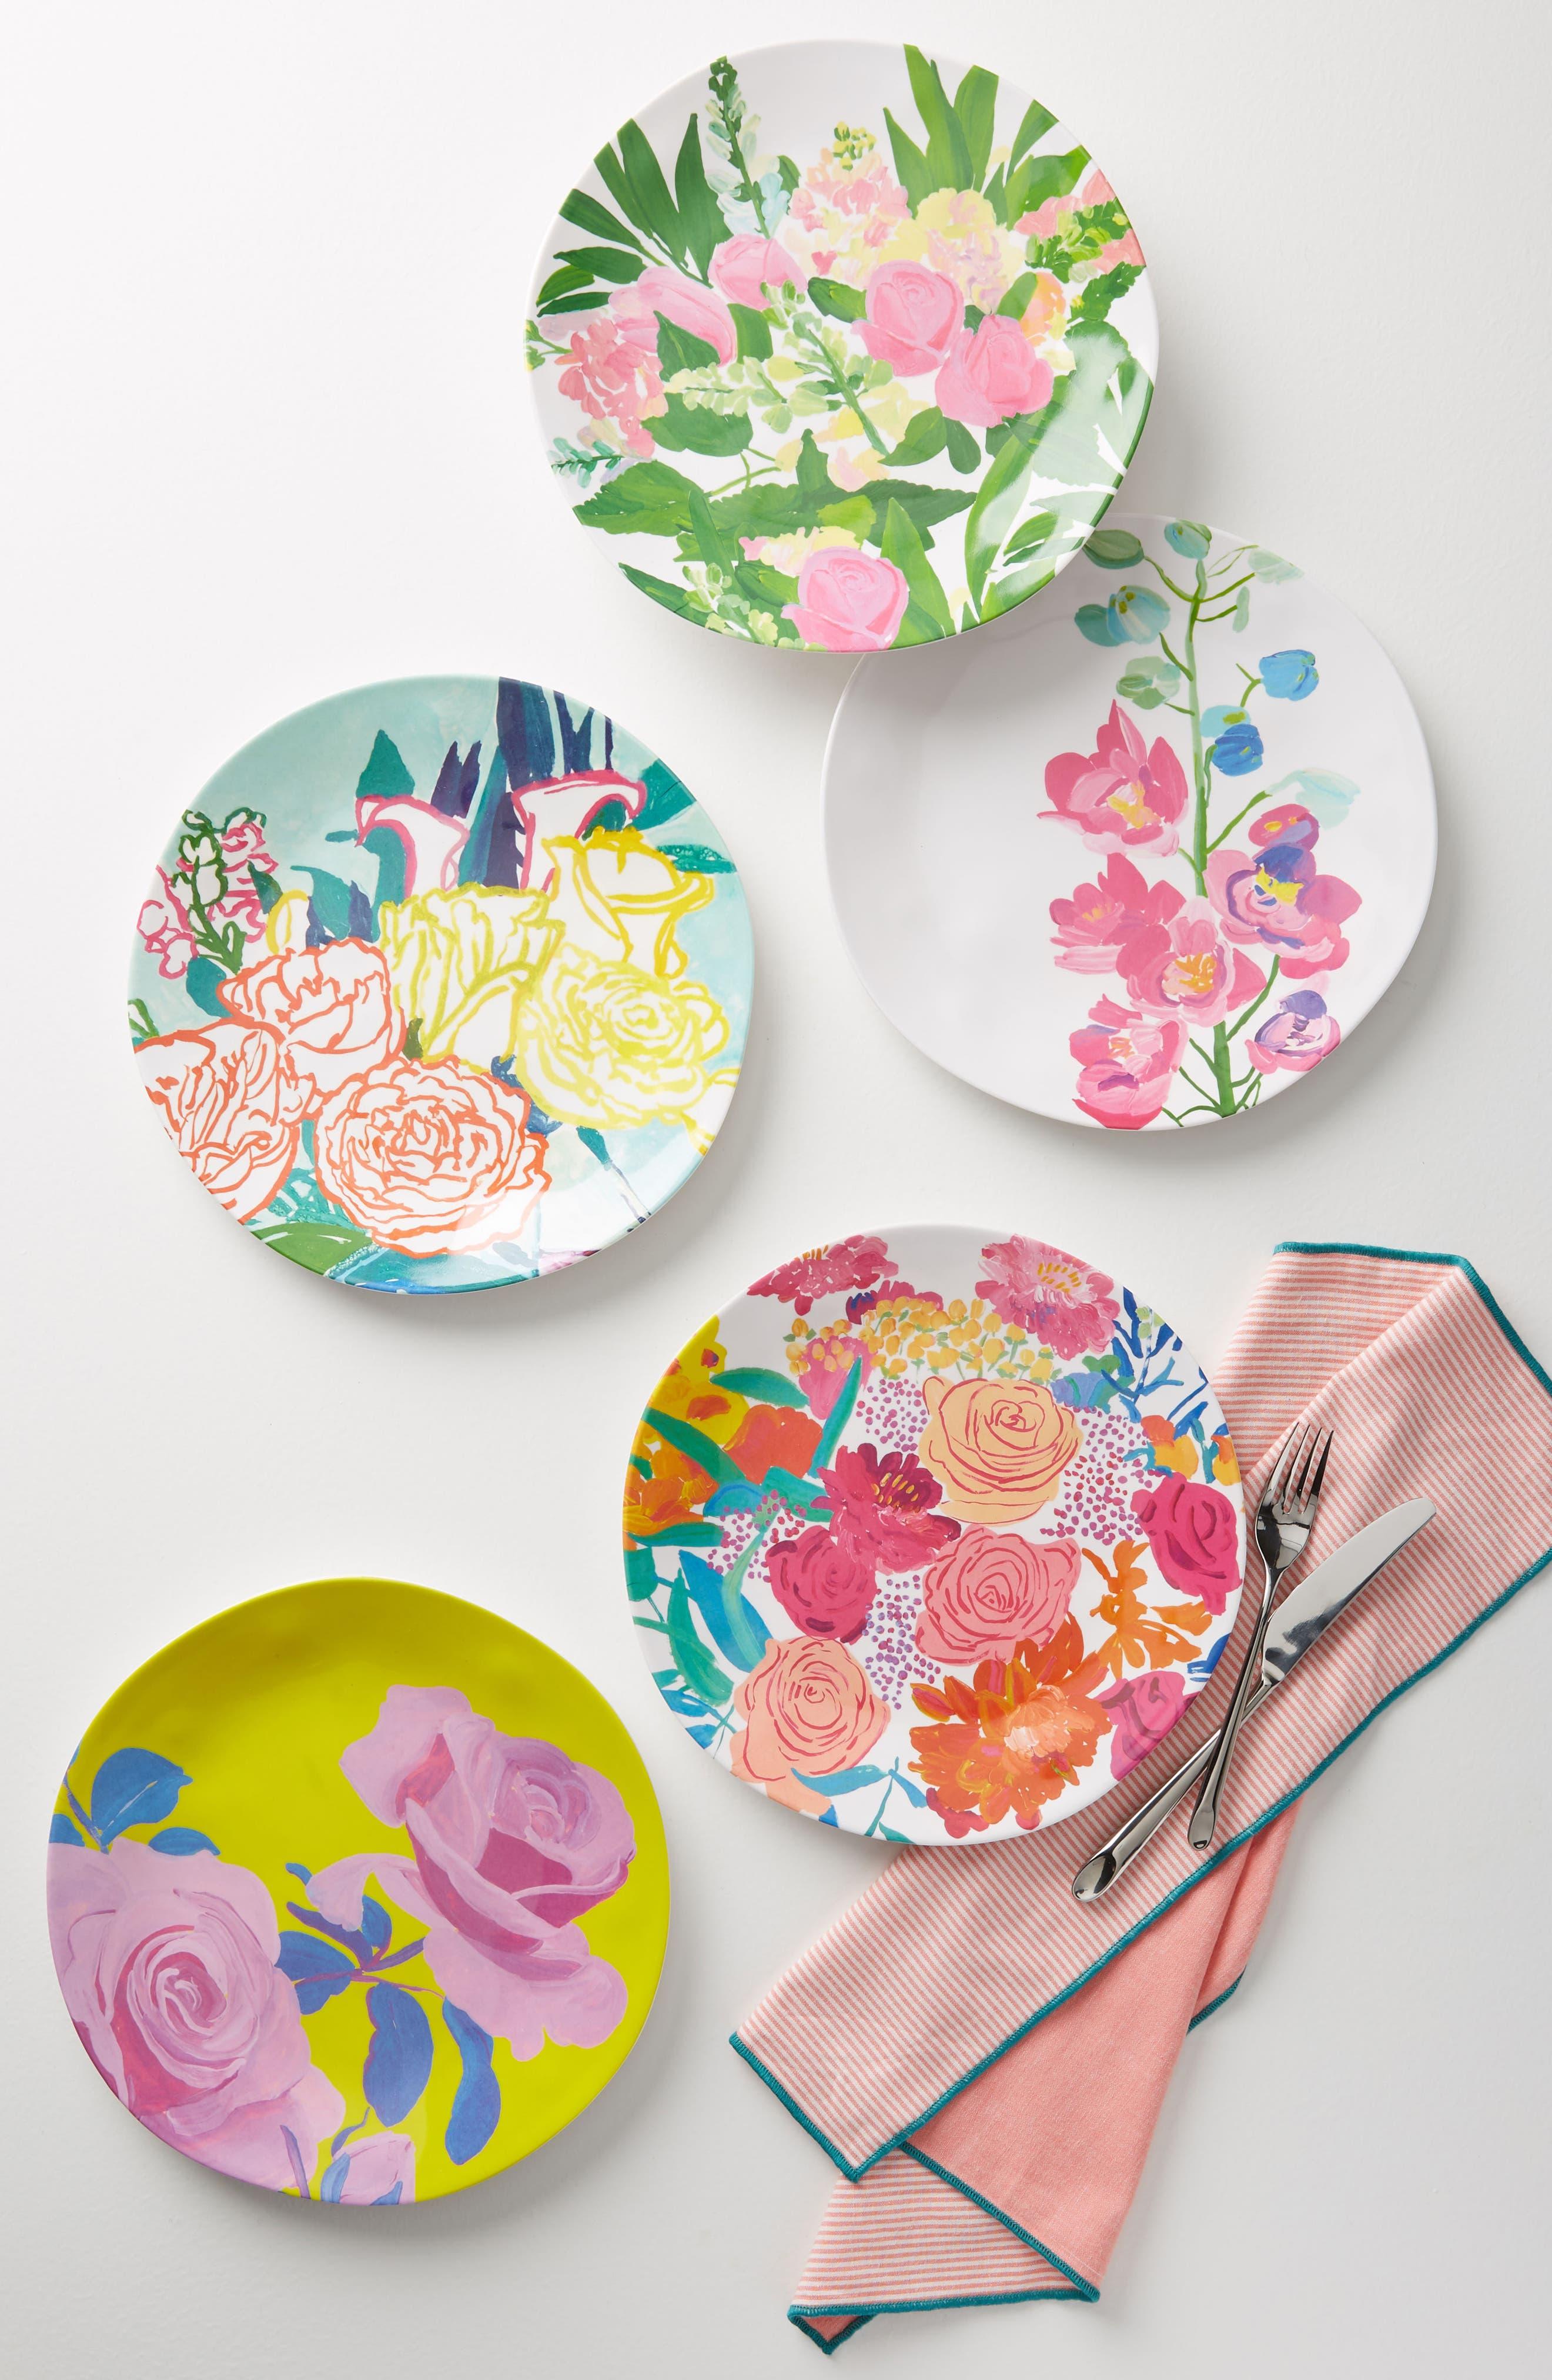 Anthropologie Paint + Petals Melamine Plate